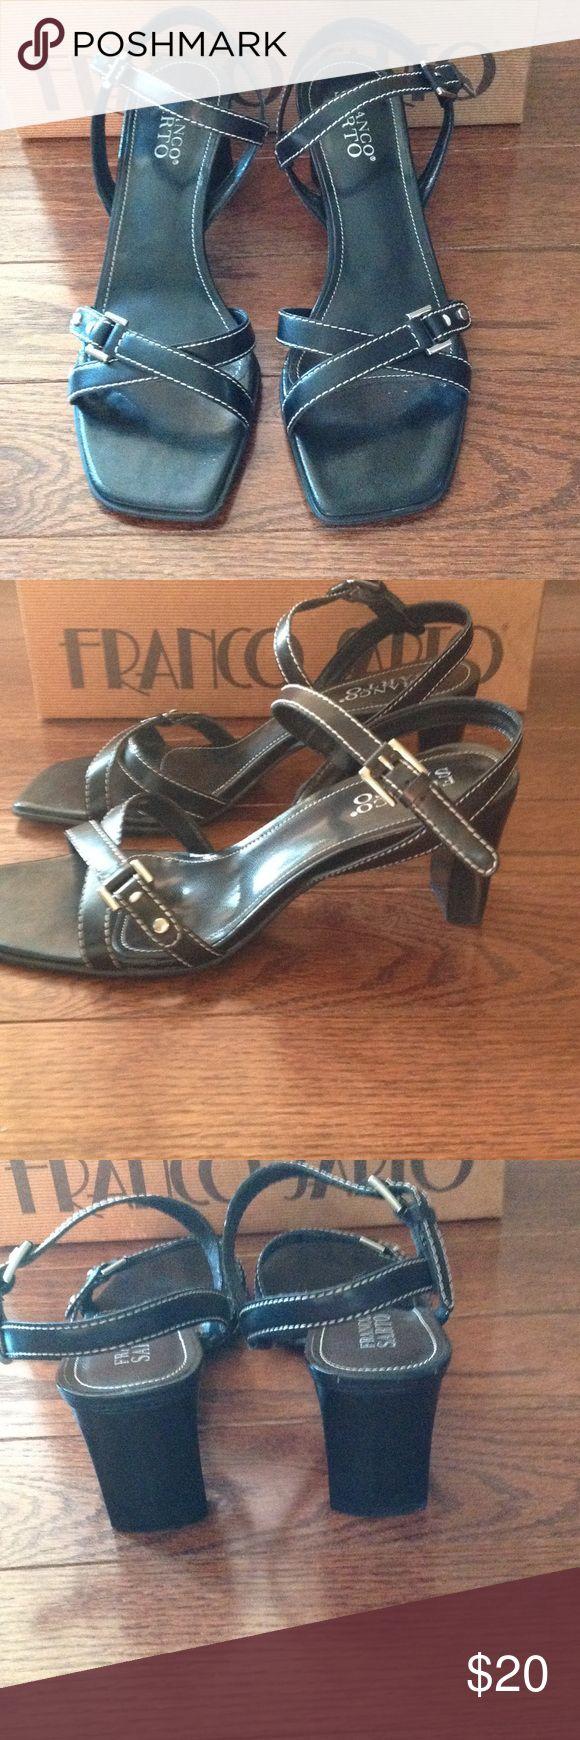 Black sandals 2 inch heel - Franco Sarto Black Heeled Sandal Approx 2 1 2 Inch Heel X Design On